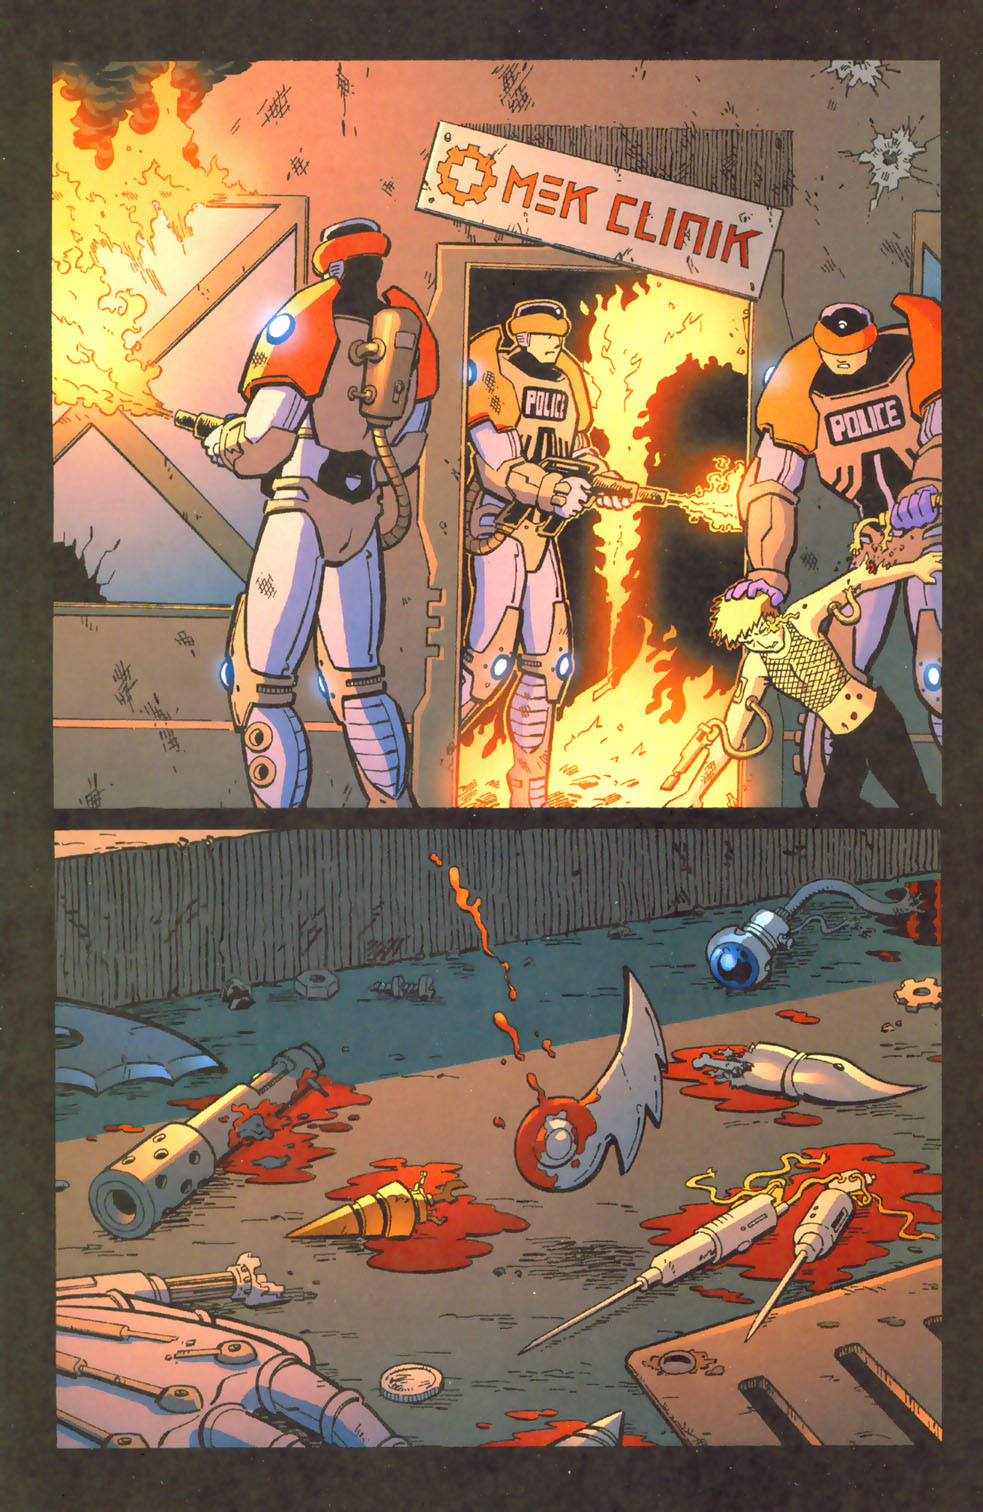 Read online Mek comic -  Issue #3 - 22